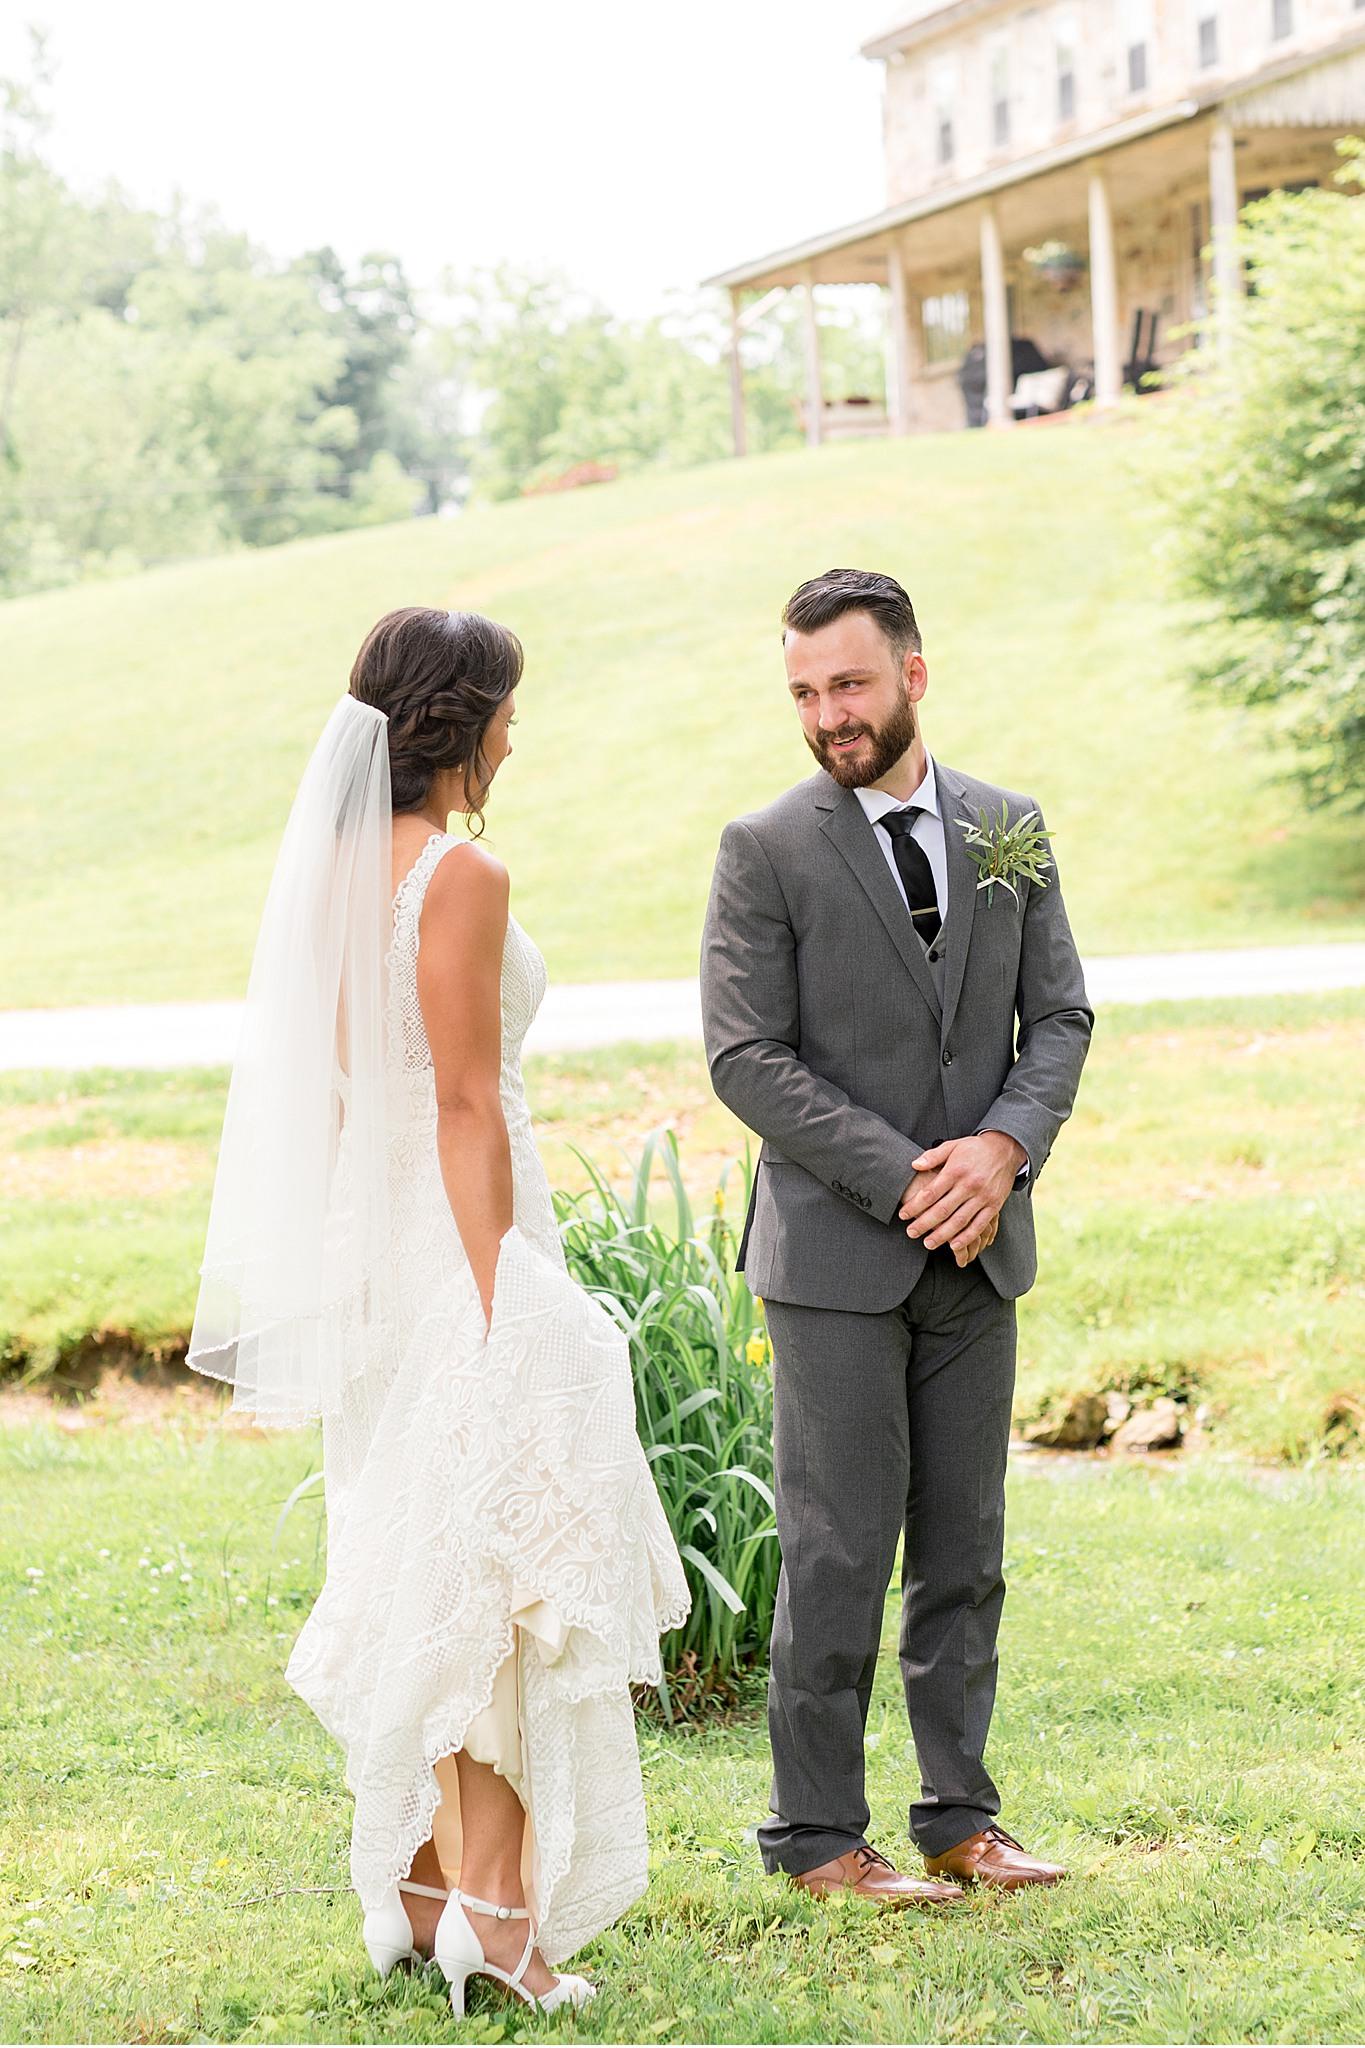 Simmontown wedding Barn Lancaster PA wedding engagement Photography_3592.jpg